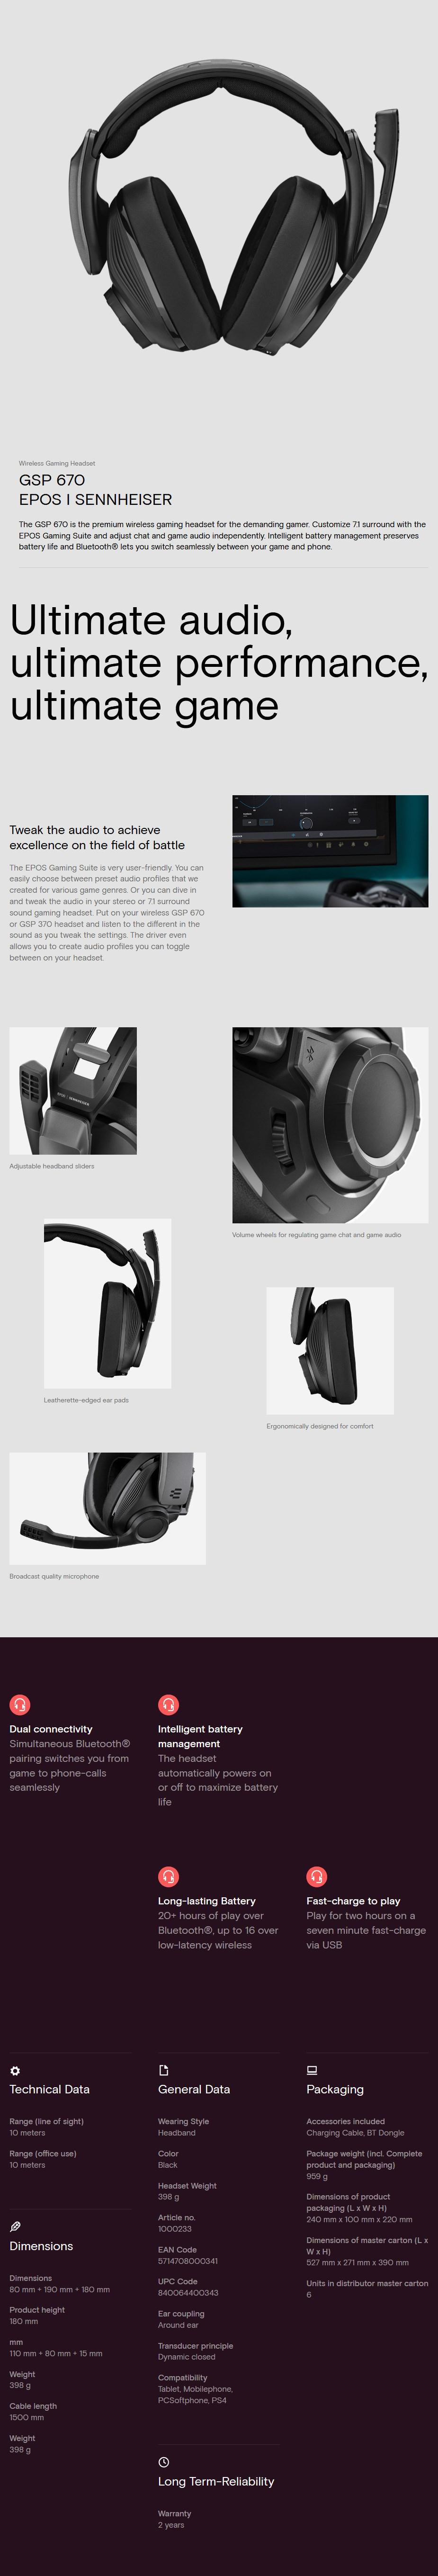 epos-sennheiser-gsp-670-71-surround-sound-afclosed-back-wireless-gaming-headset-ac36271-1.jpg